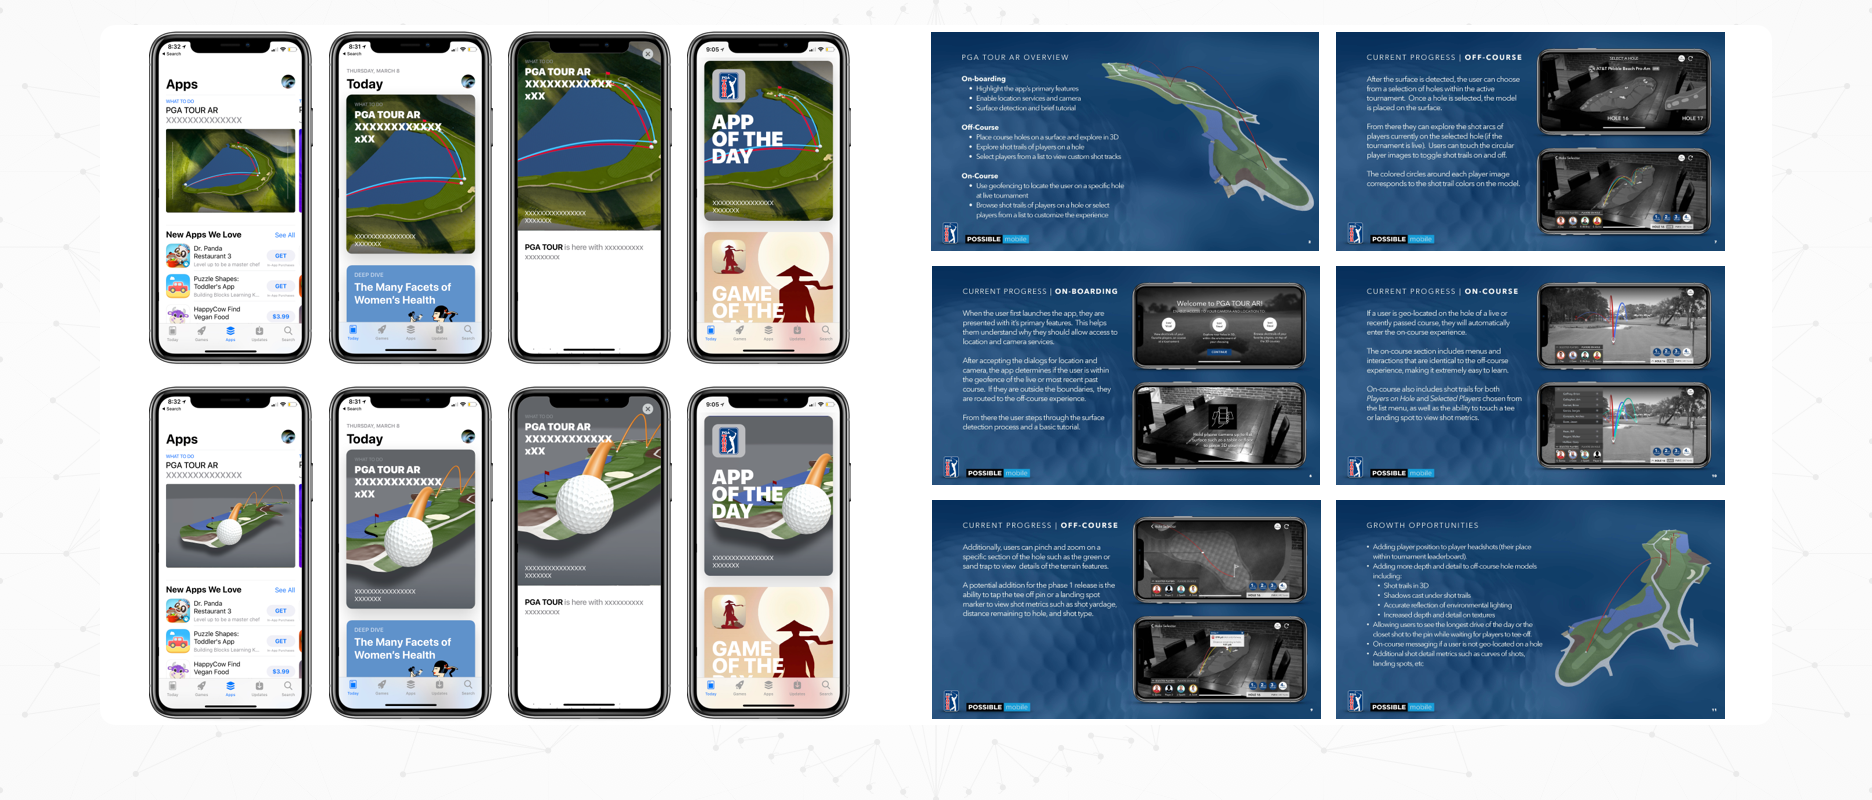 PGA TOUR AR - Case Study Image - Marketing Materials